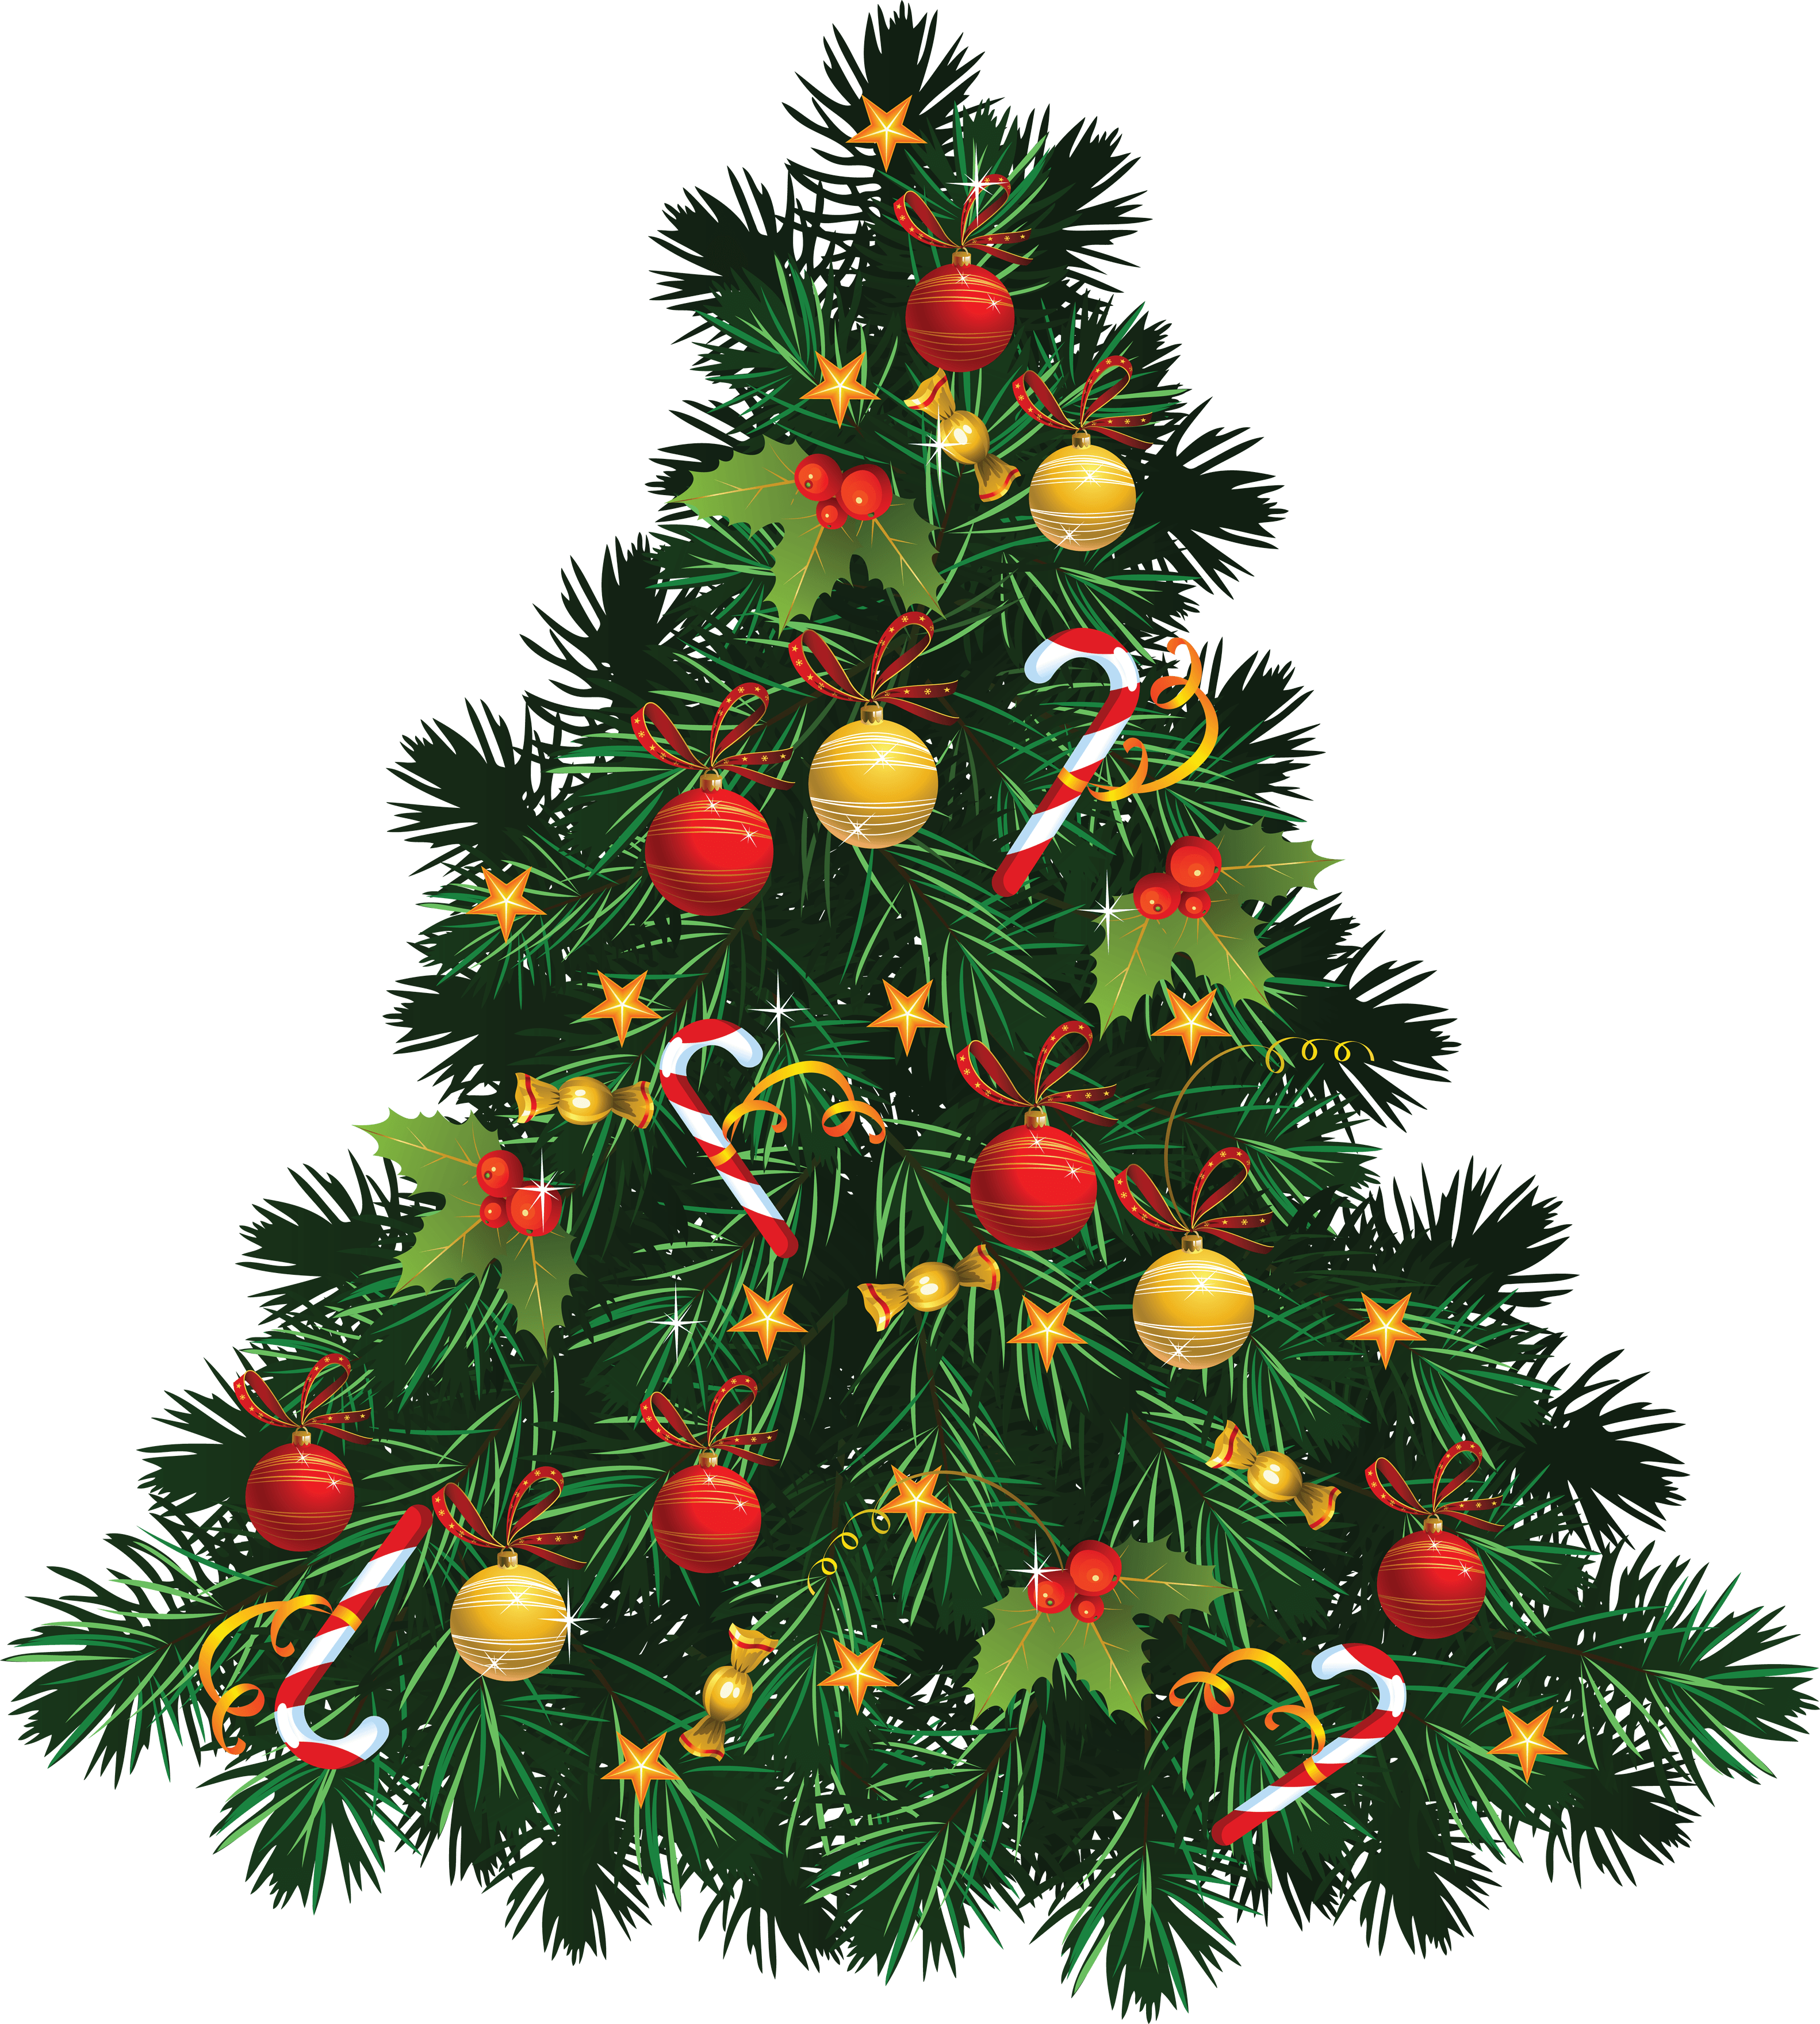 Download christmas free png photo images and clipart freepngimg christmas fir tree png image png image buycottarizona Image collections